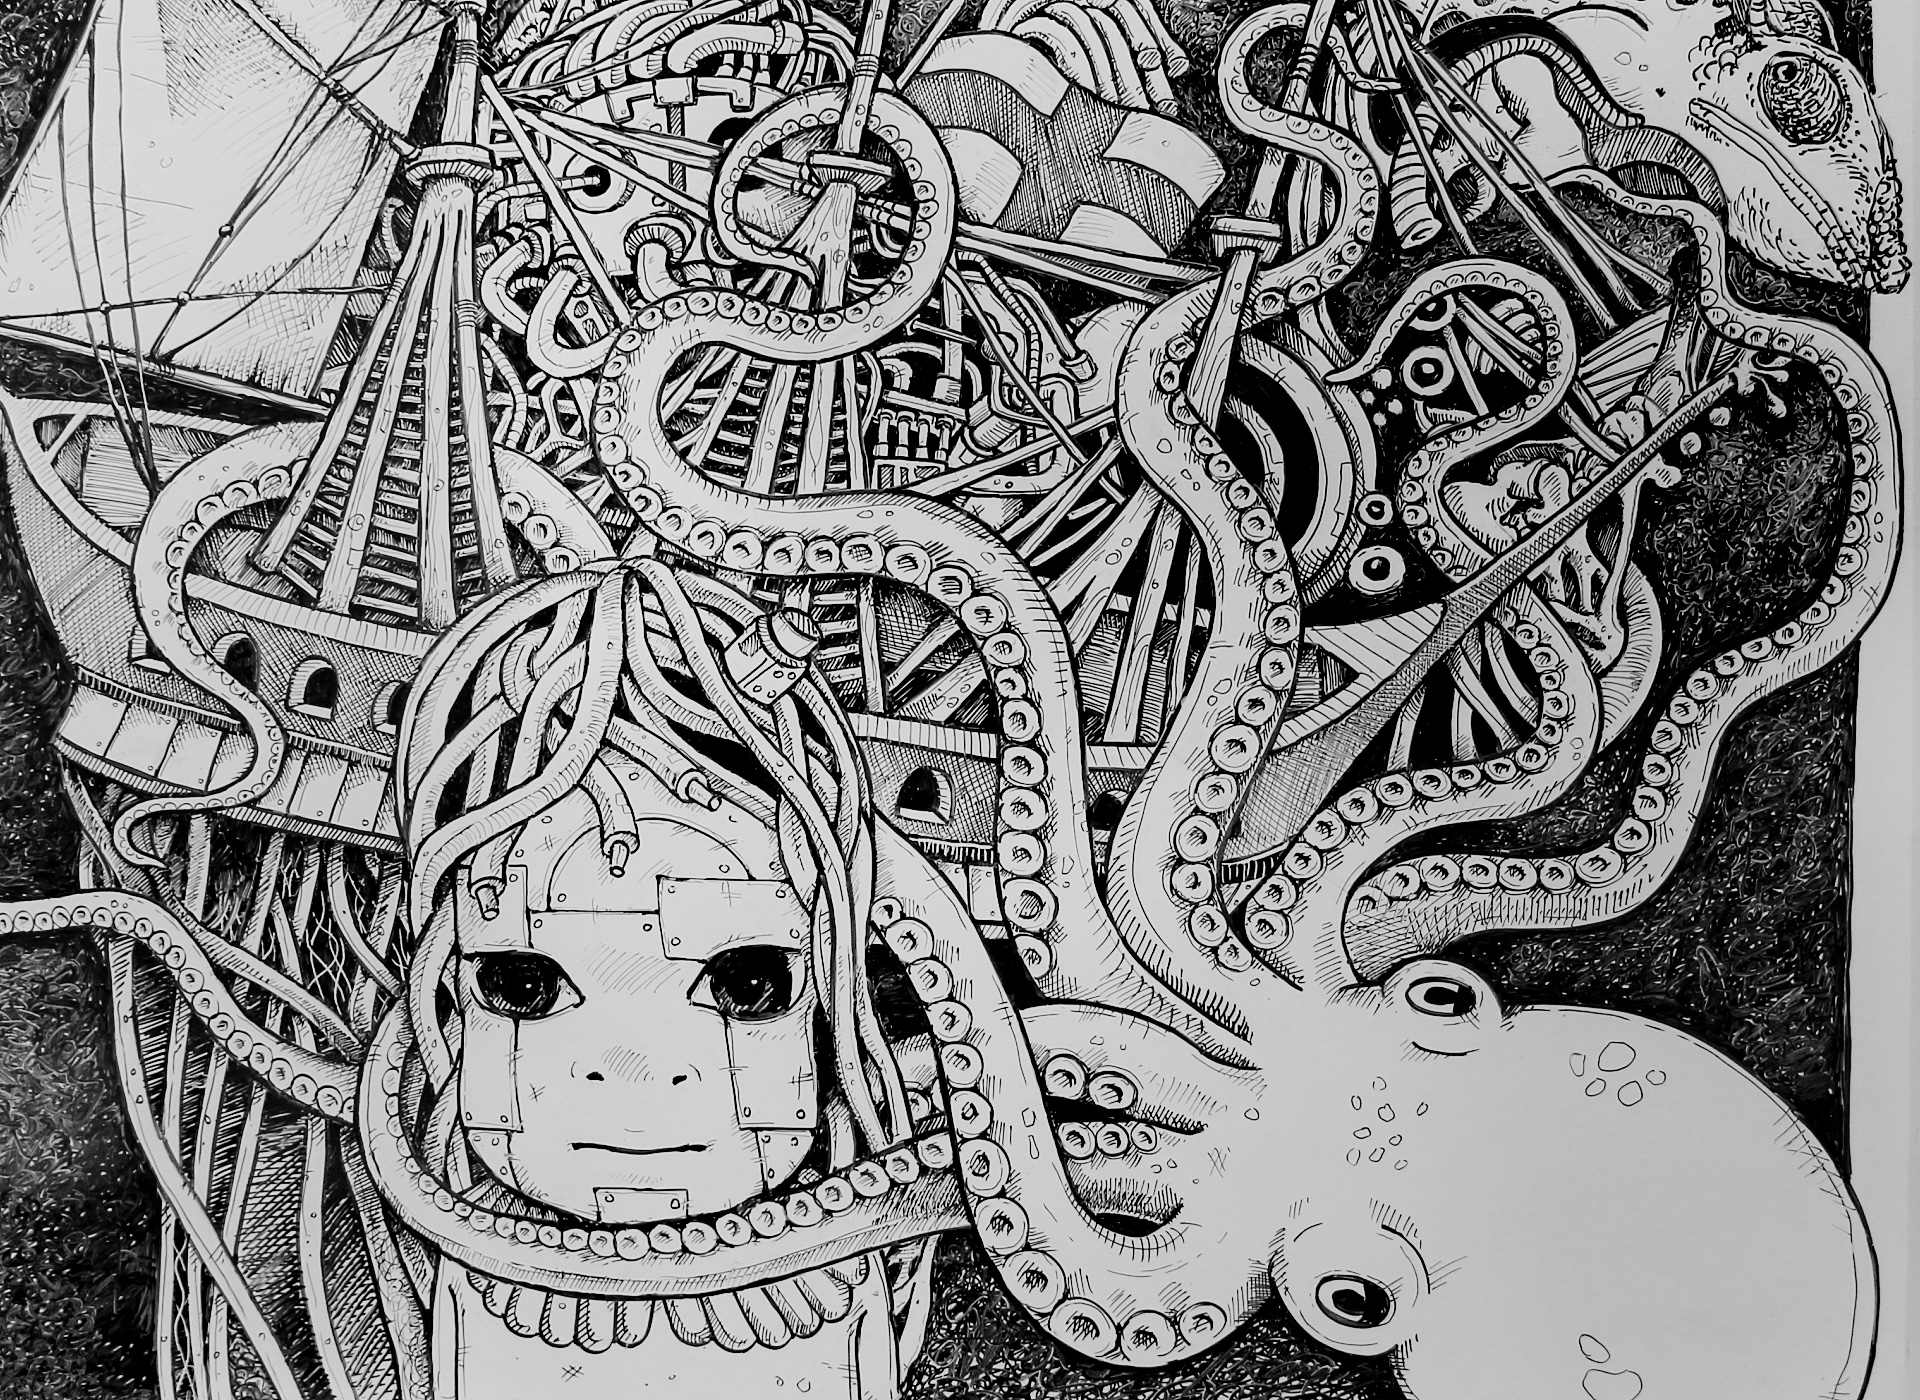 doodles7.jpg